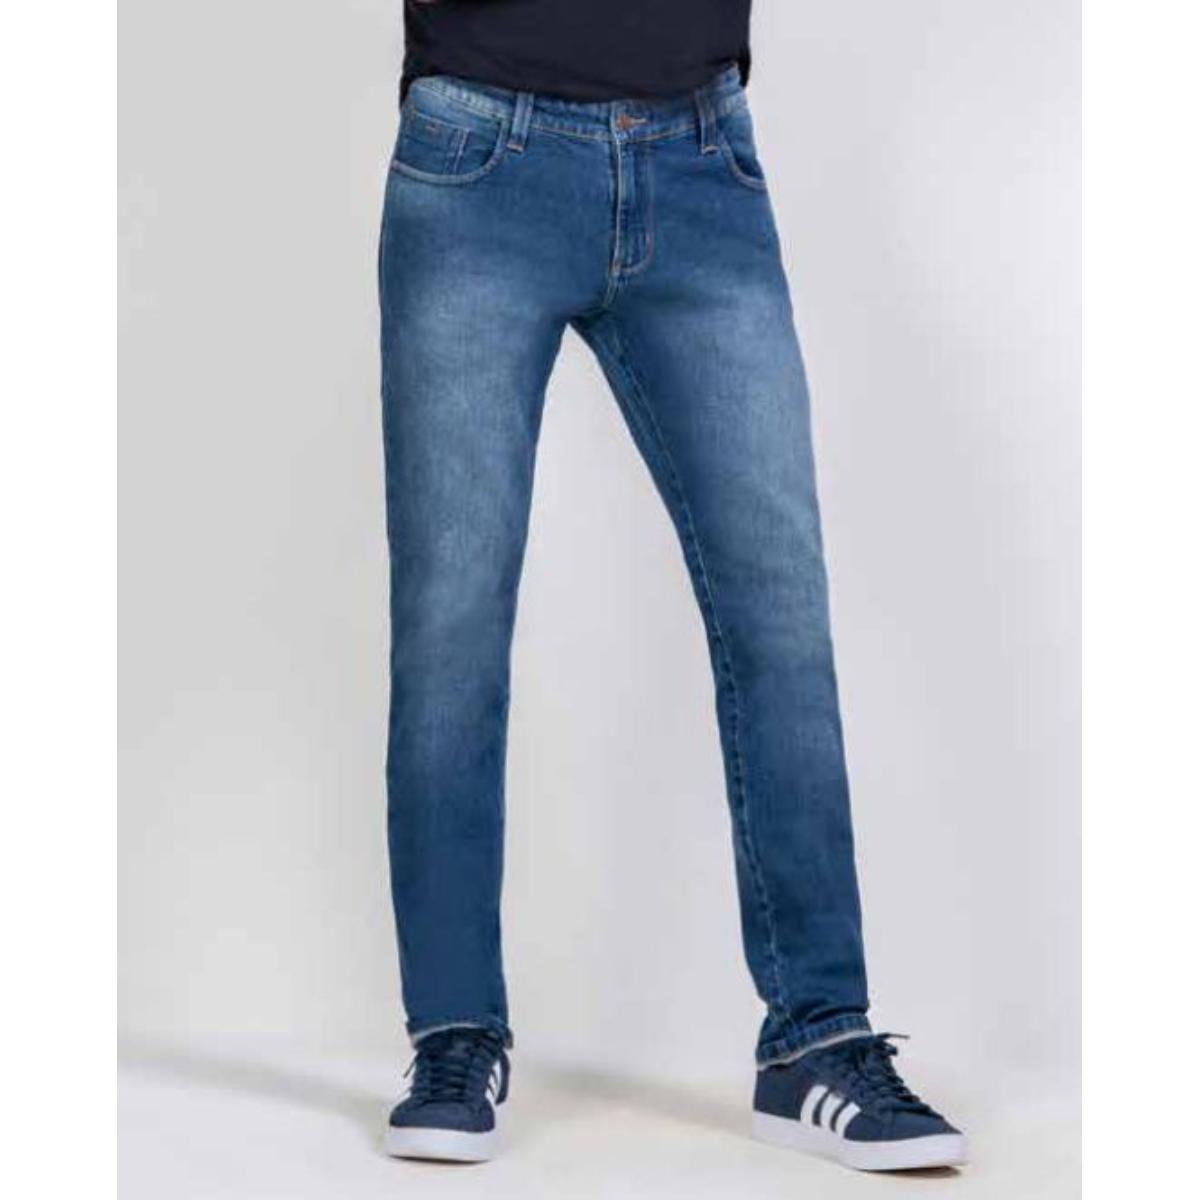 Calça Masculina Kacolako K21050 Jeans